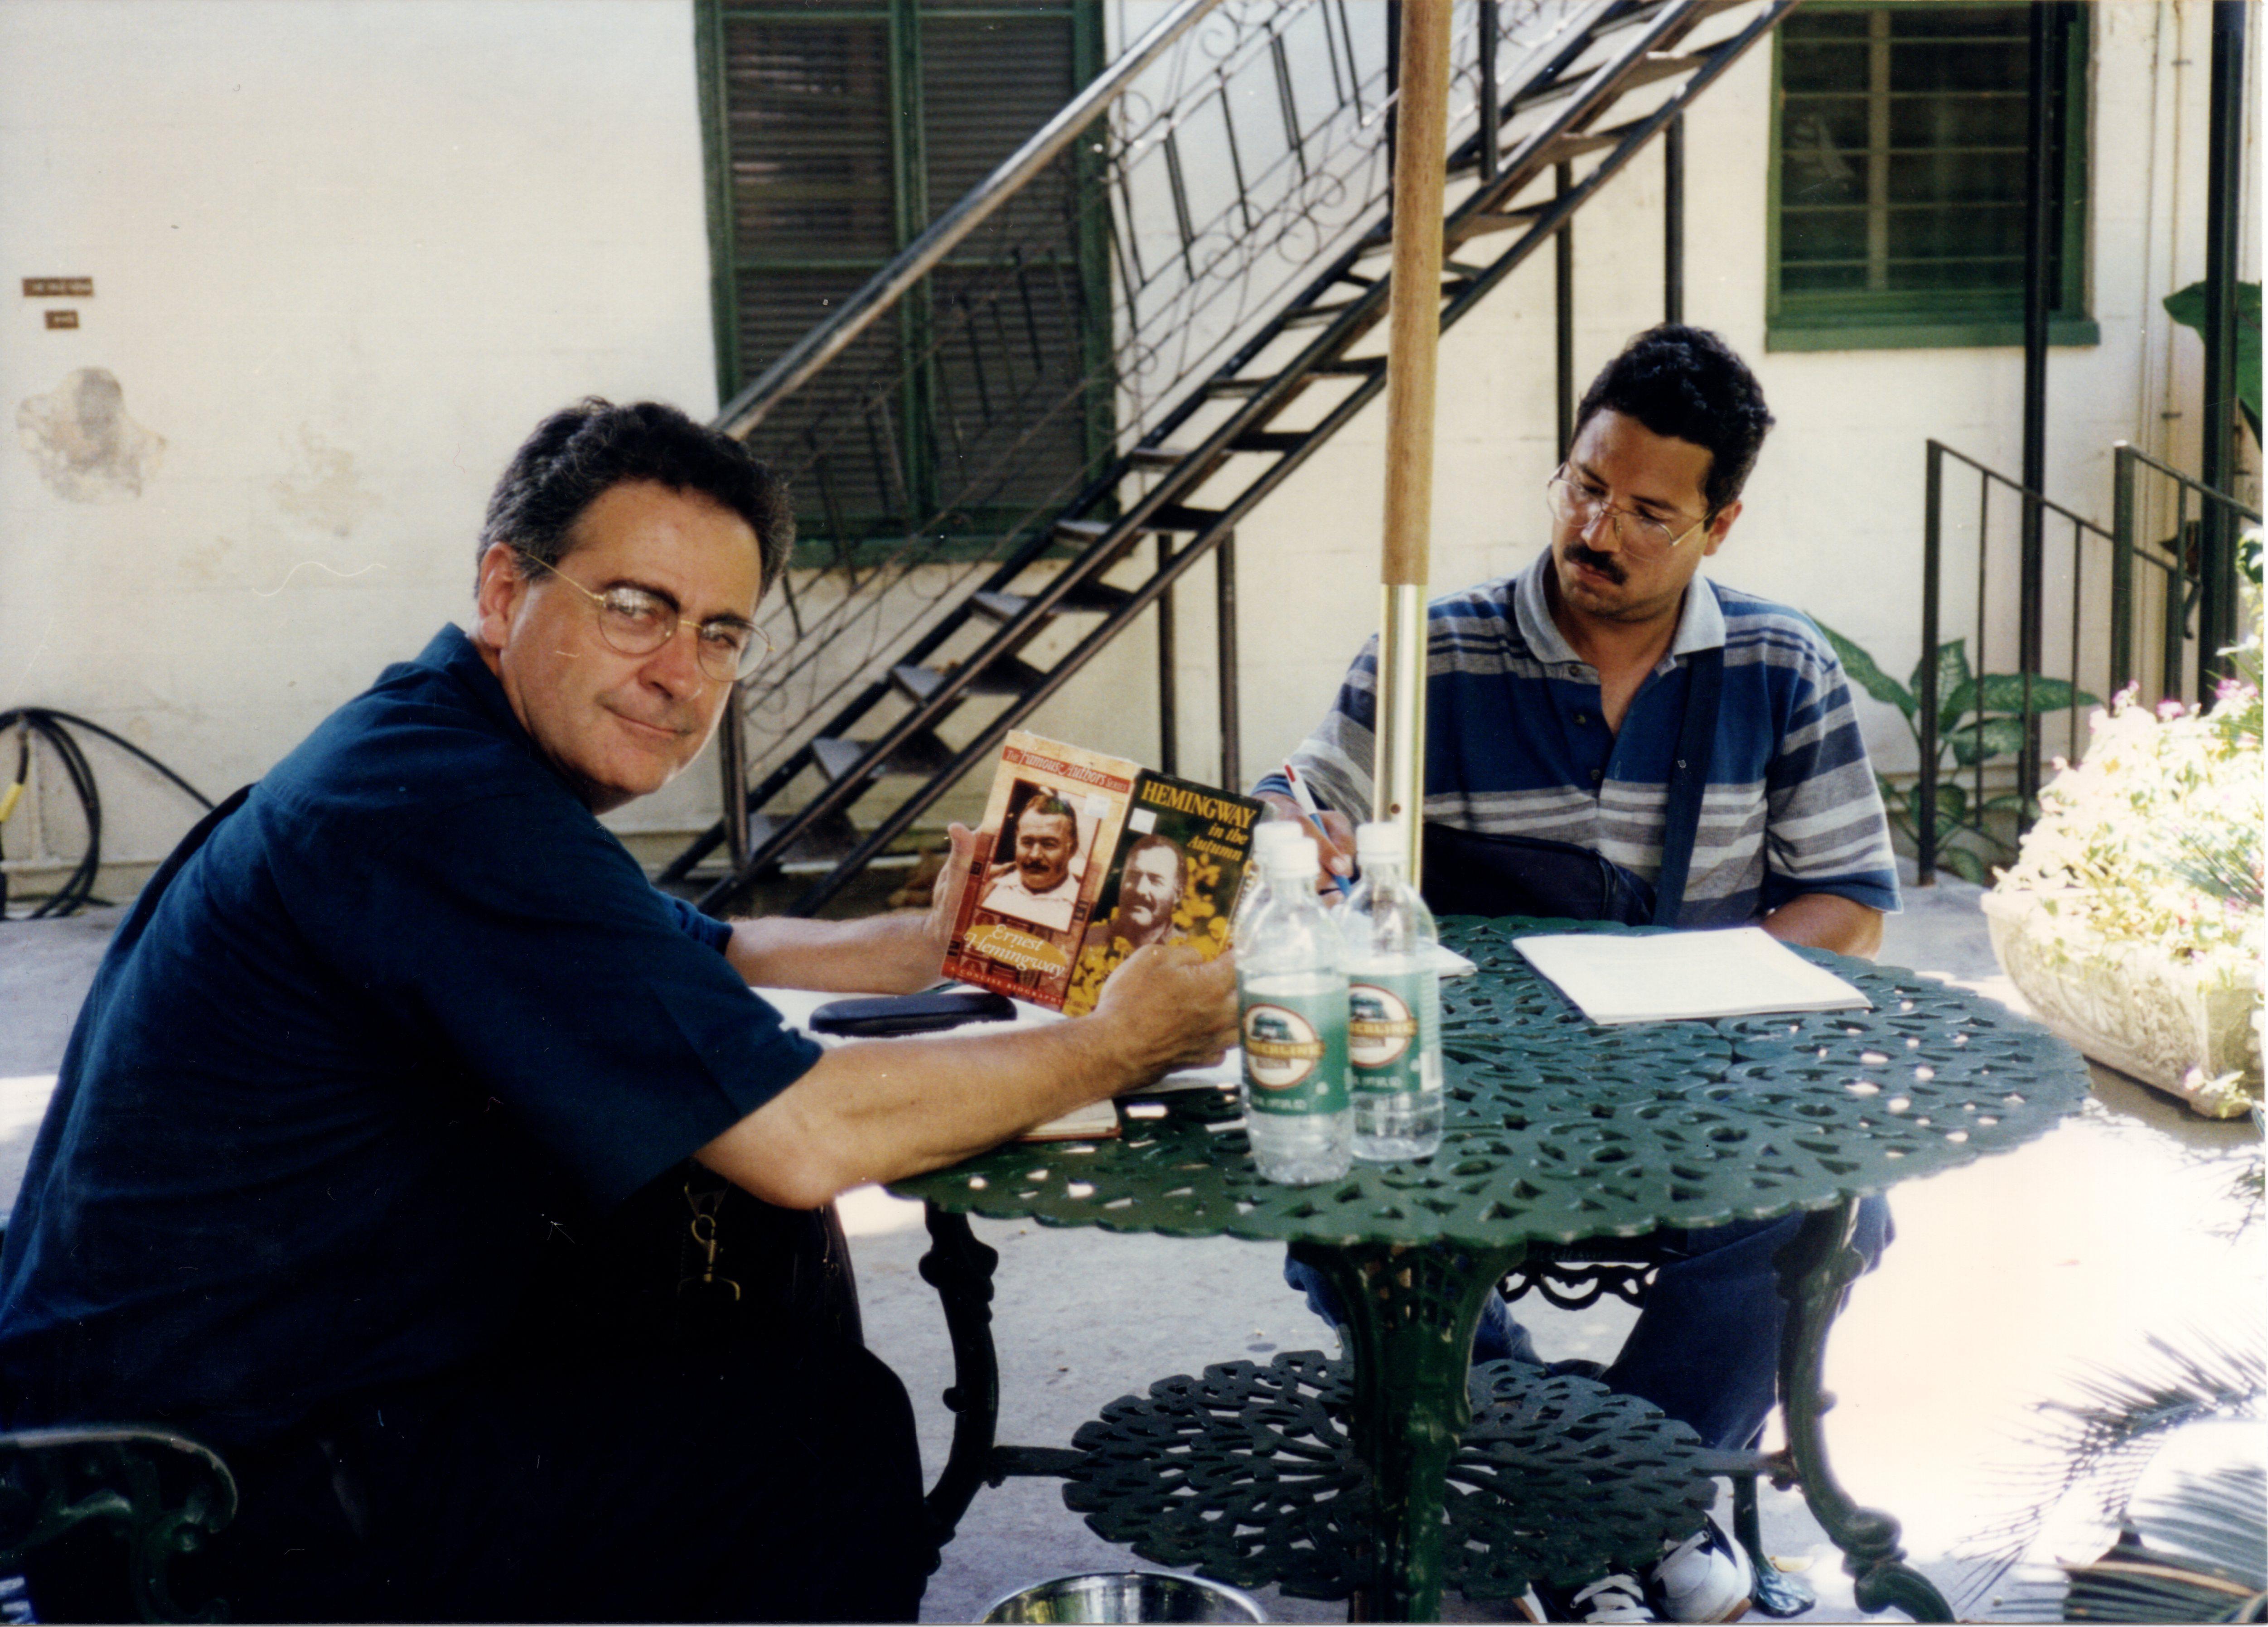 En casa de Hemingway